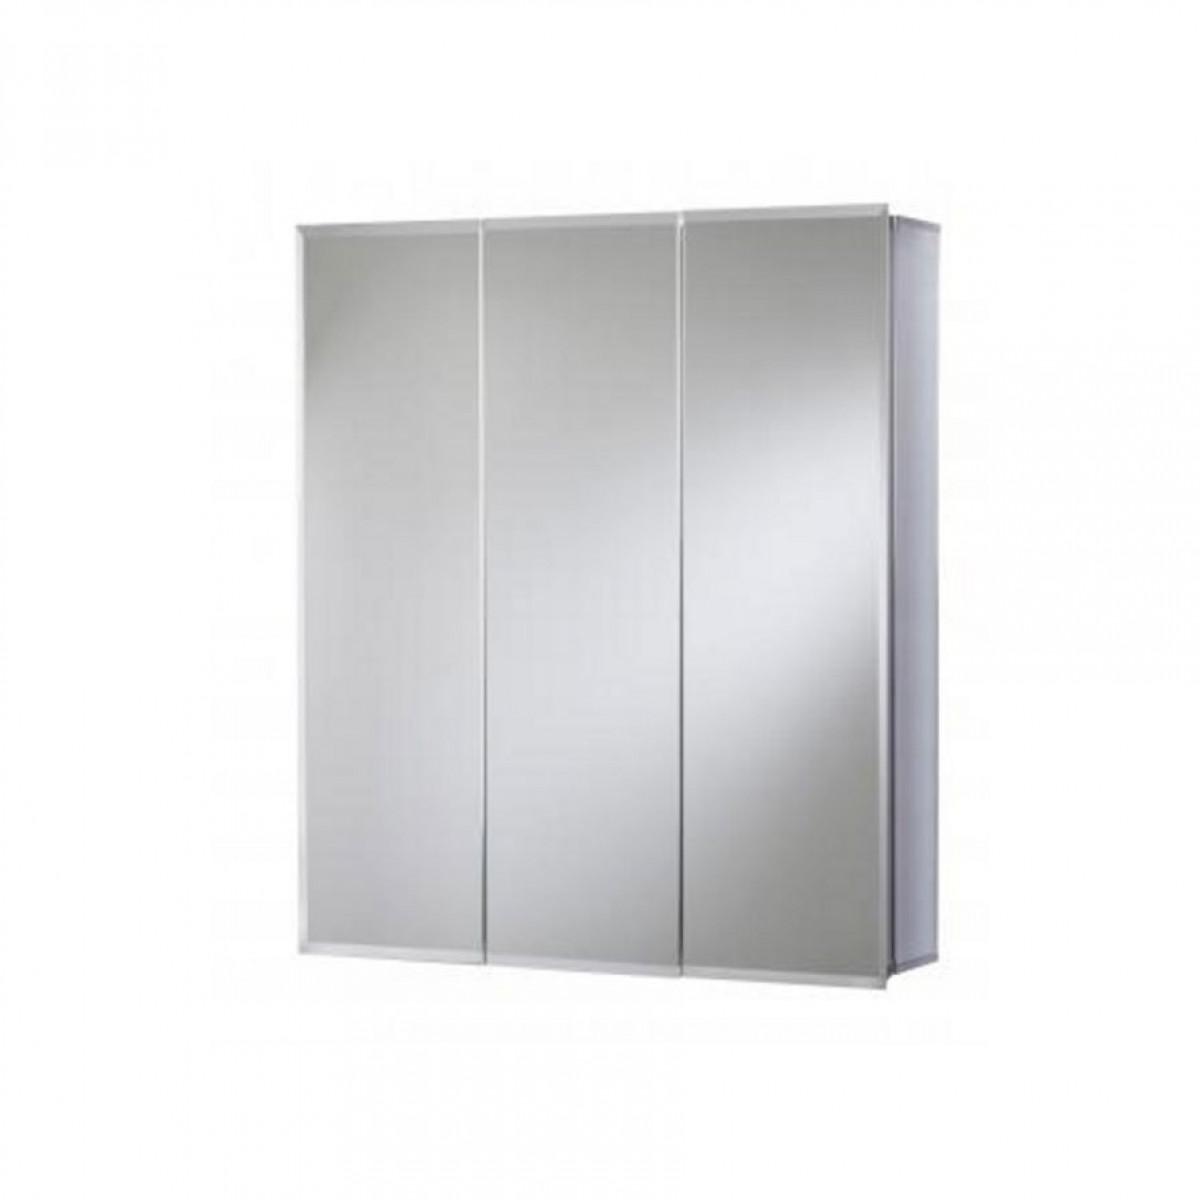 croydex loexley triple door tri view cabinet wc101869